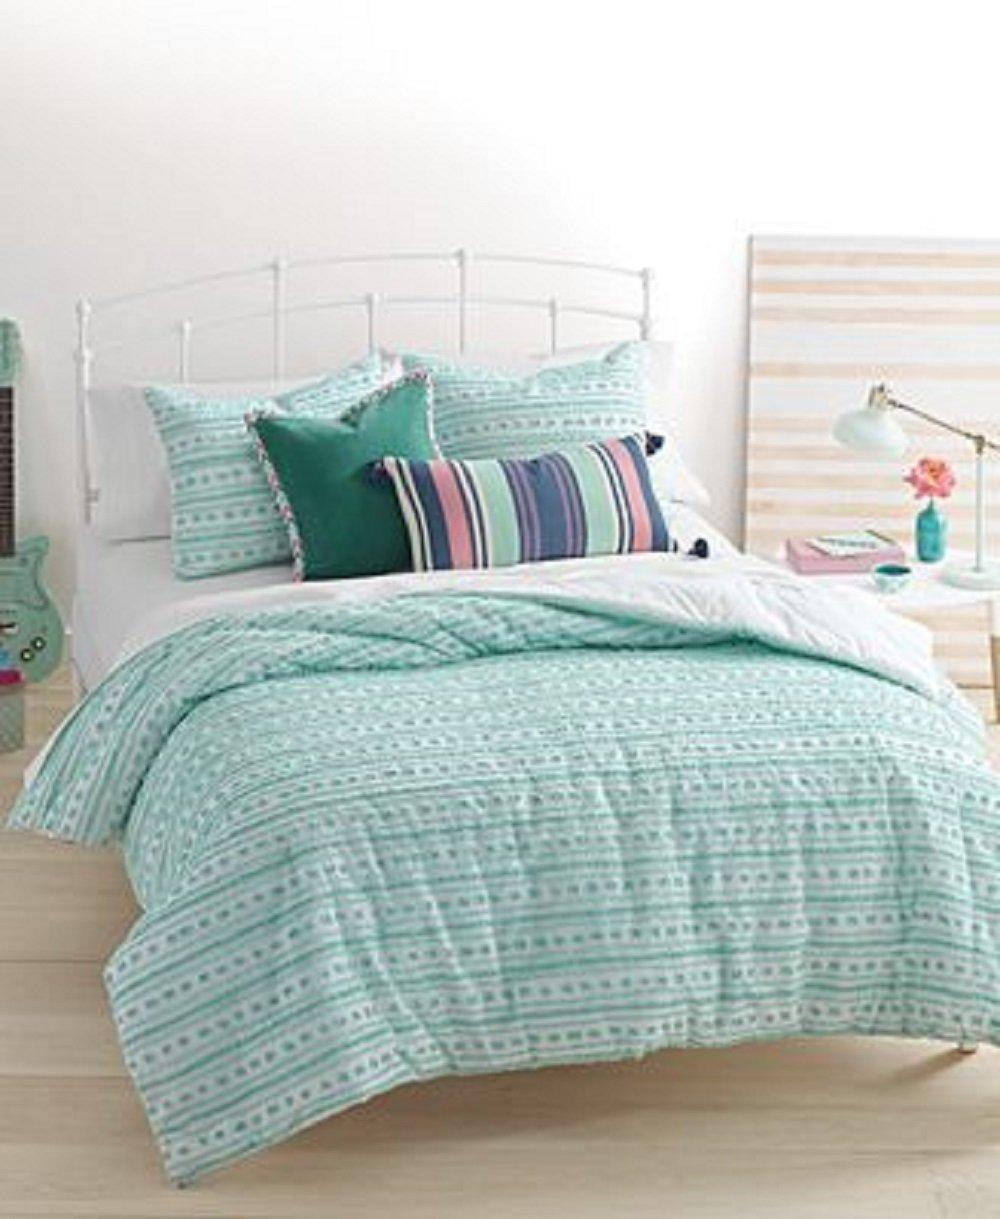 Martha Stewart Whim On the Dot Full/Queen Comforter Cover Set Seafoam